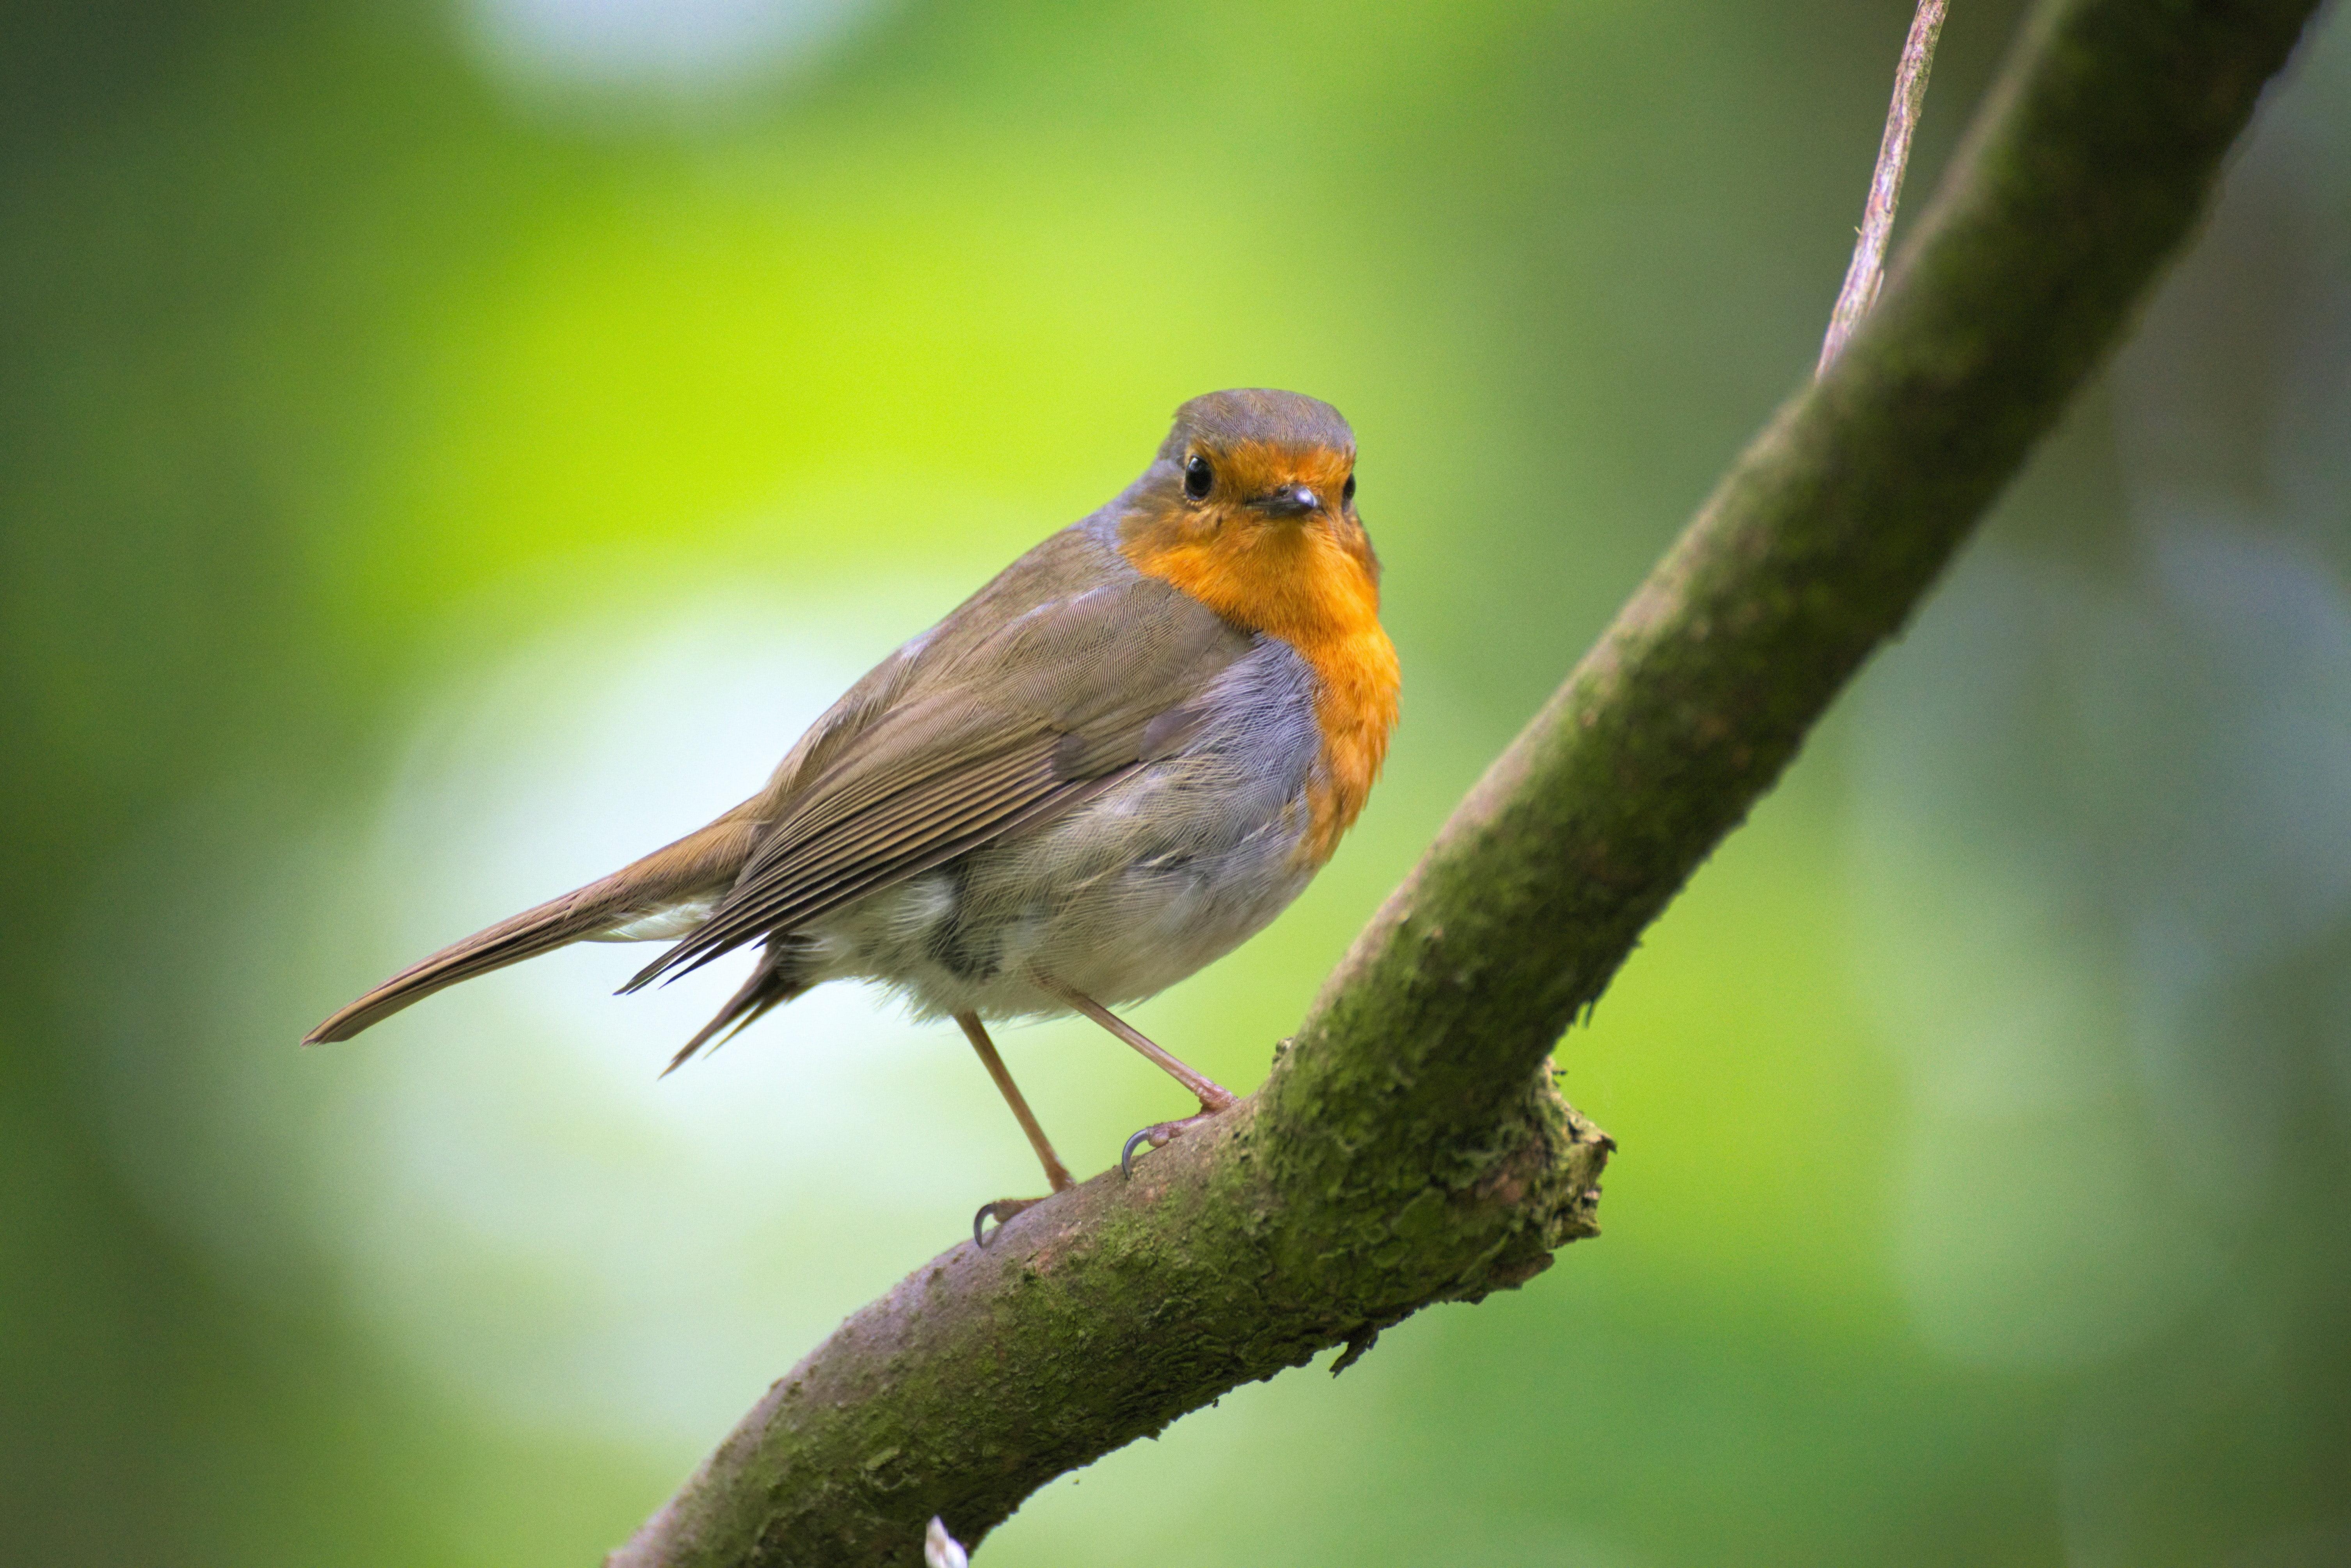 Spring birdsong